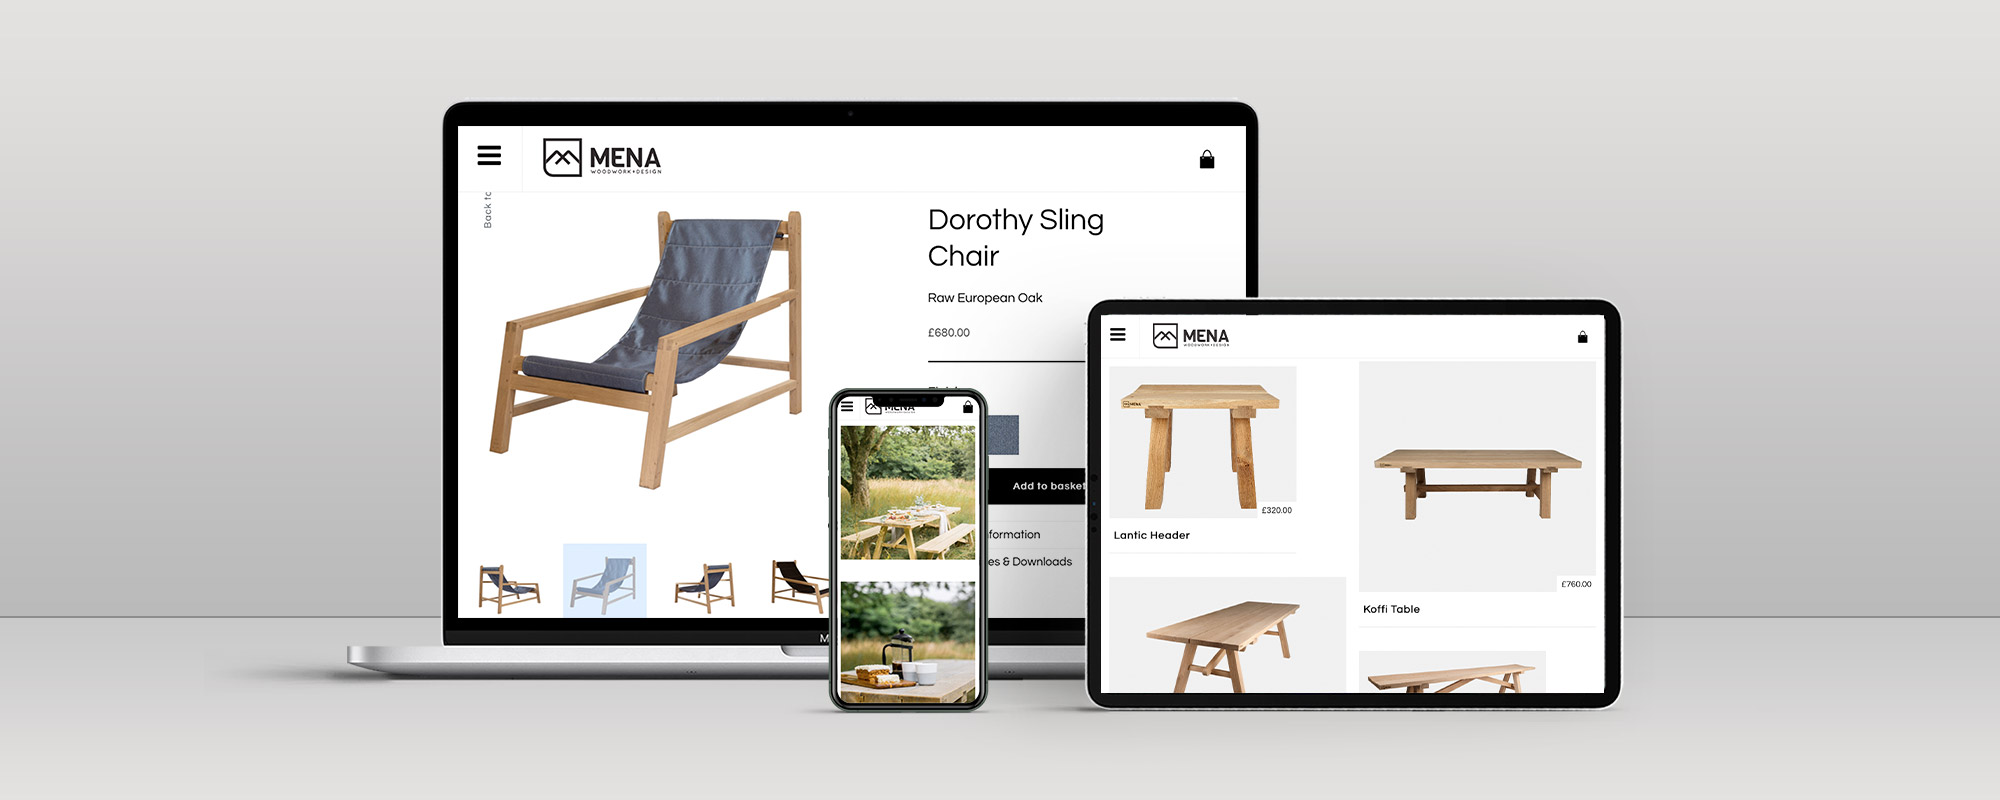 Mena Woodwork Wordpress Website Design on 3 Devices